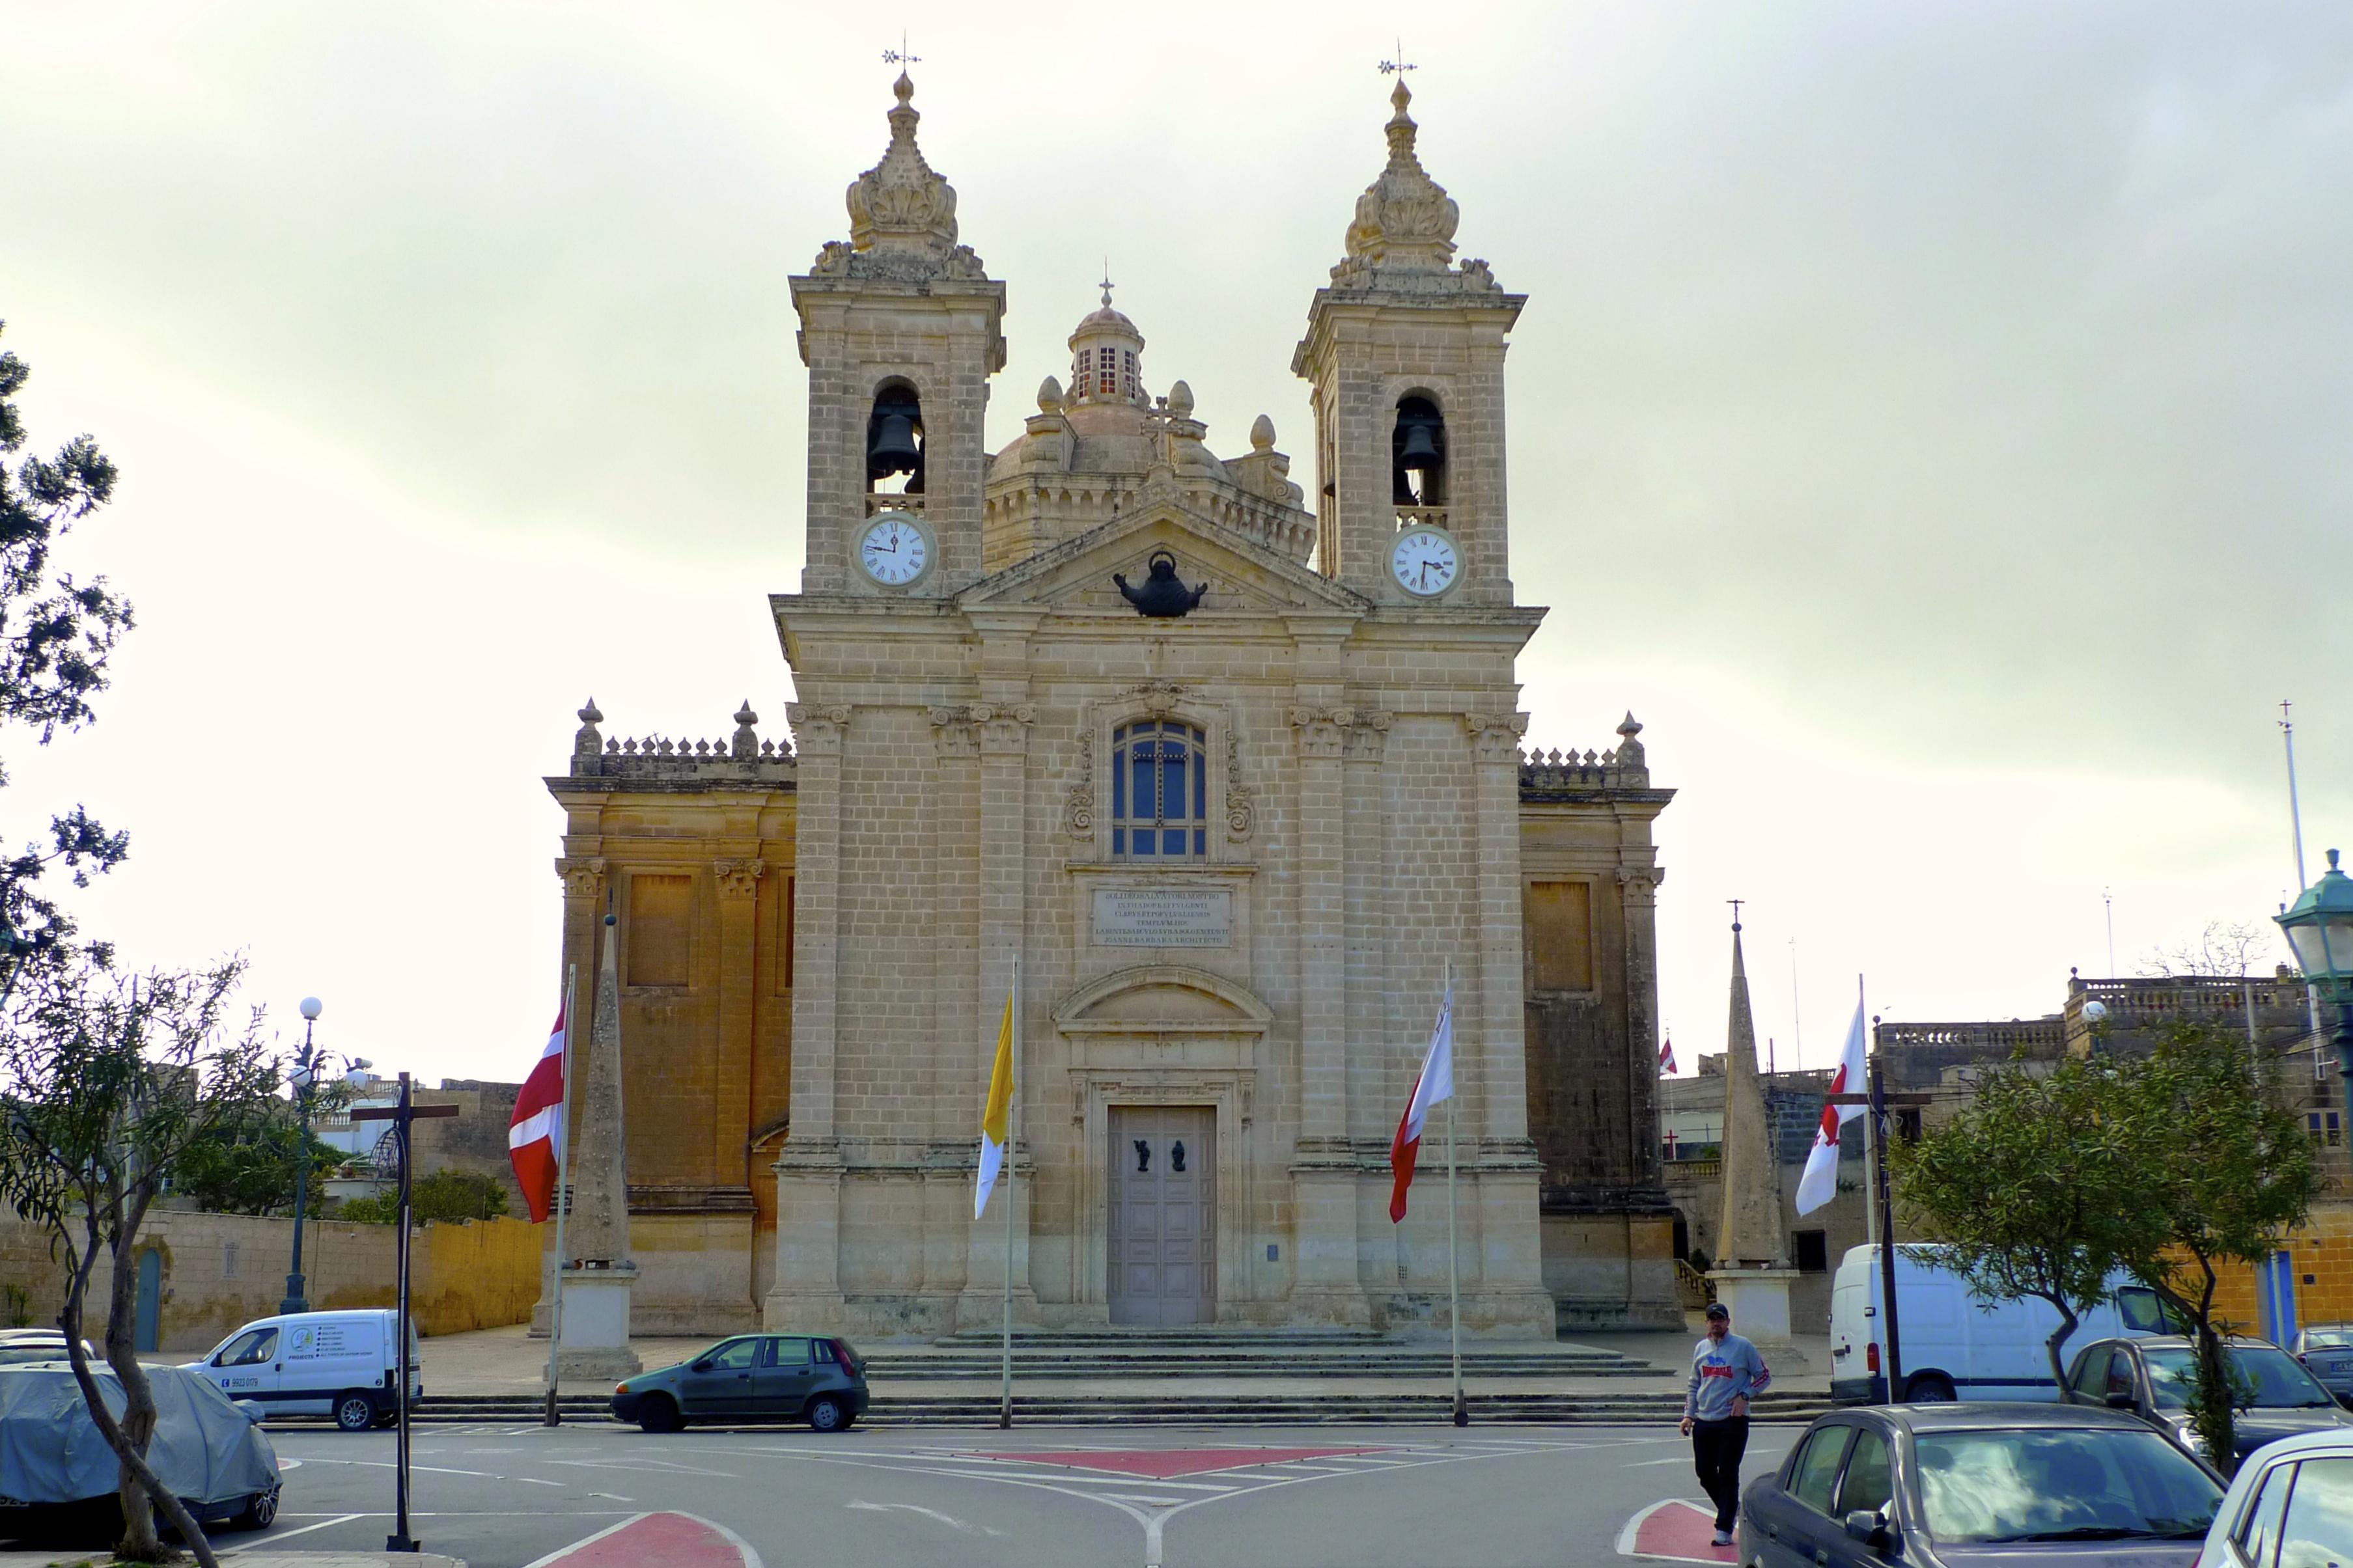 MALTA; OUR SAVIOR'S CHURCH; LIJA